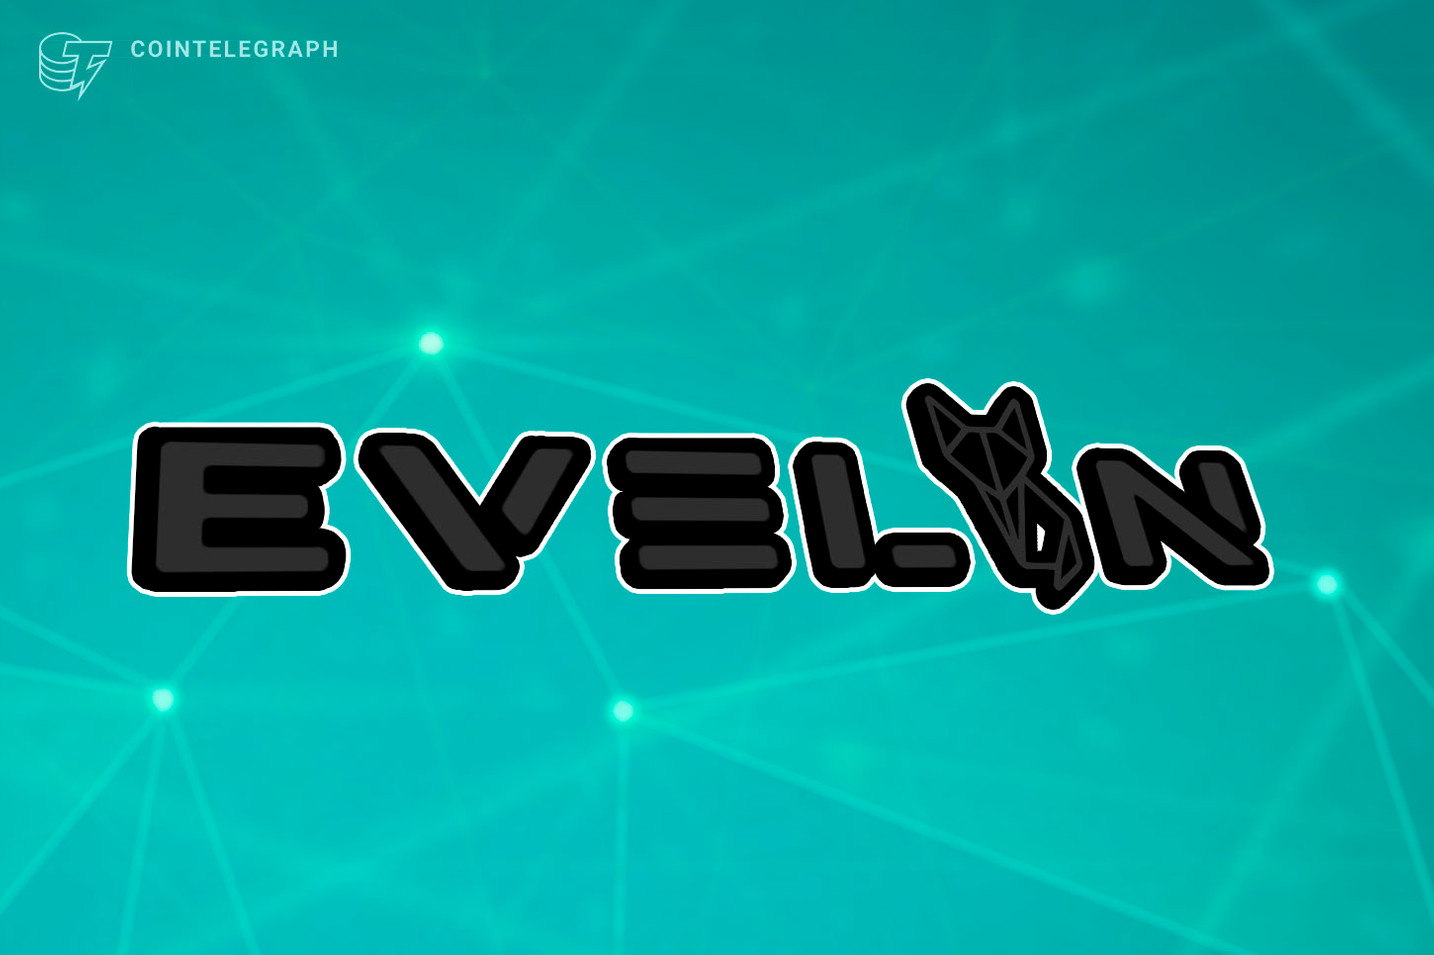 Evelyn, a new NFT social platform, presents its project on July 1